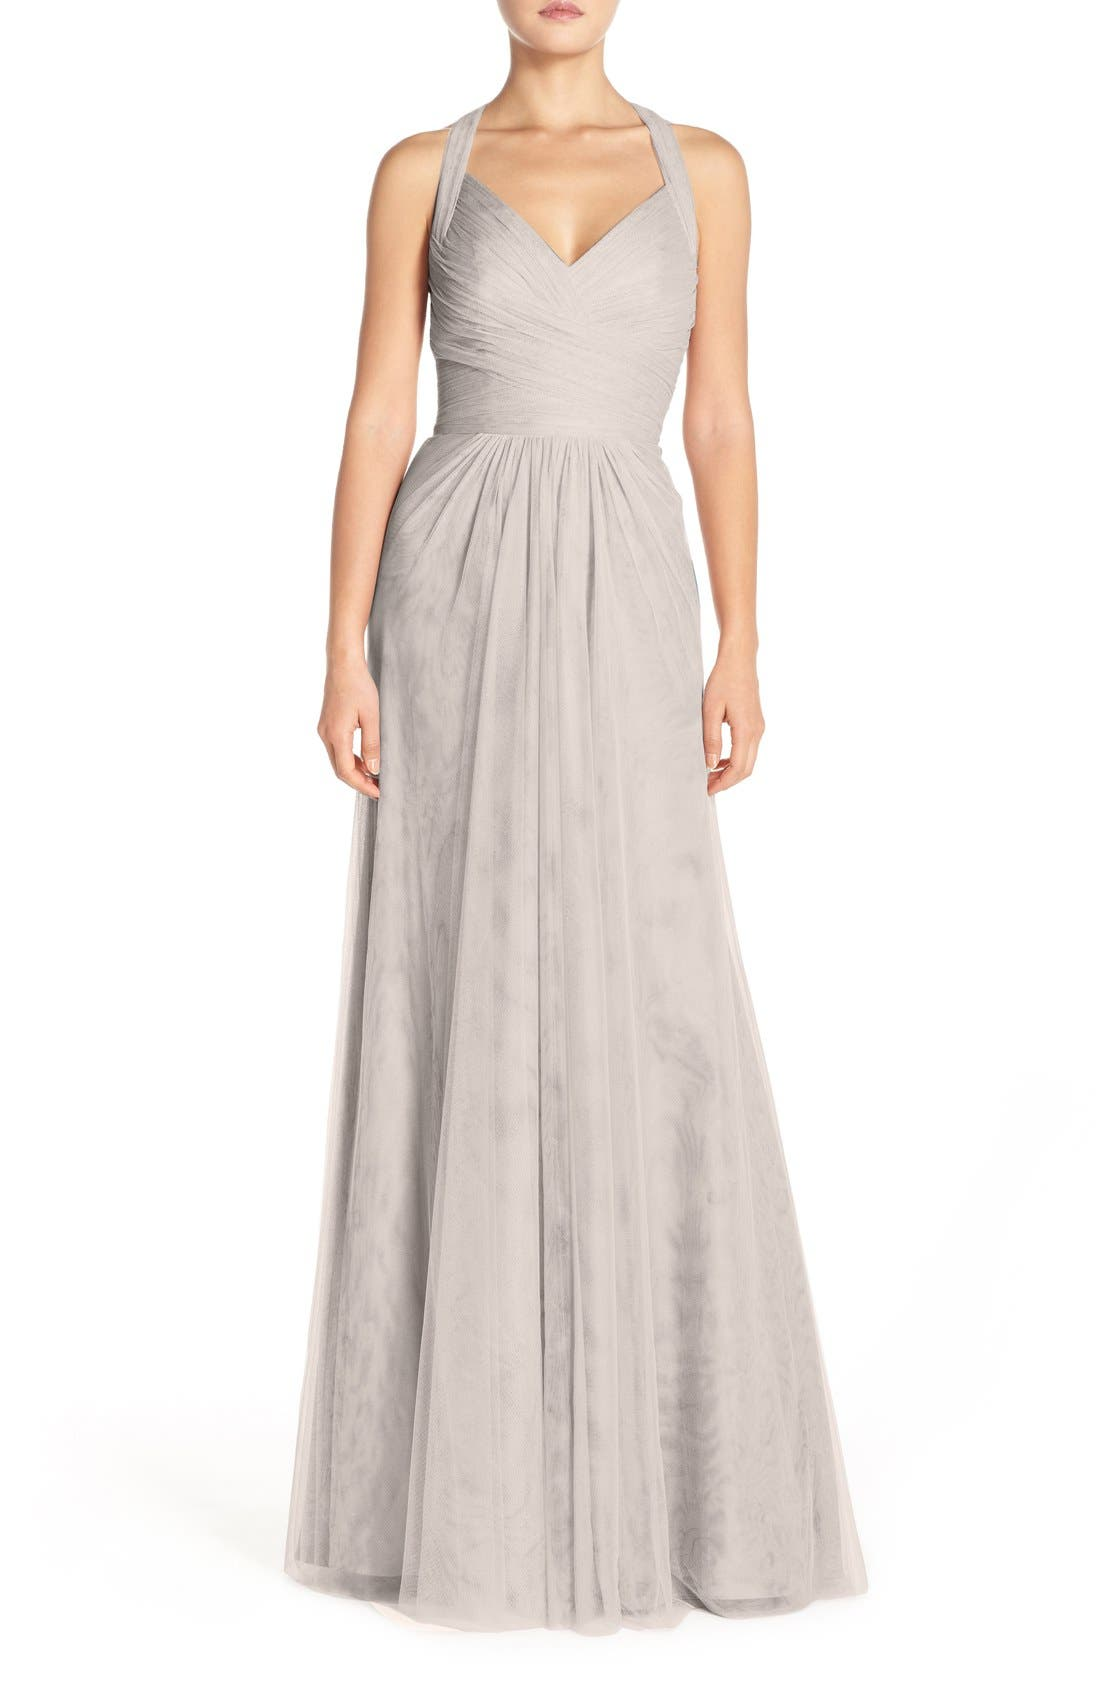 Monique Lhuillier Bridesmaids Sleeveless V-Neck Tulle Gown